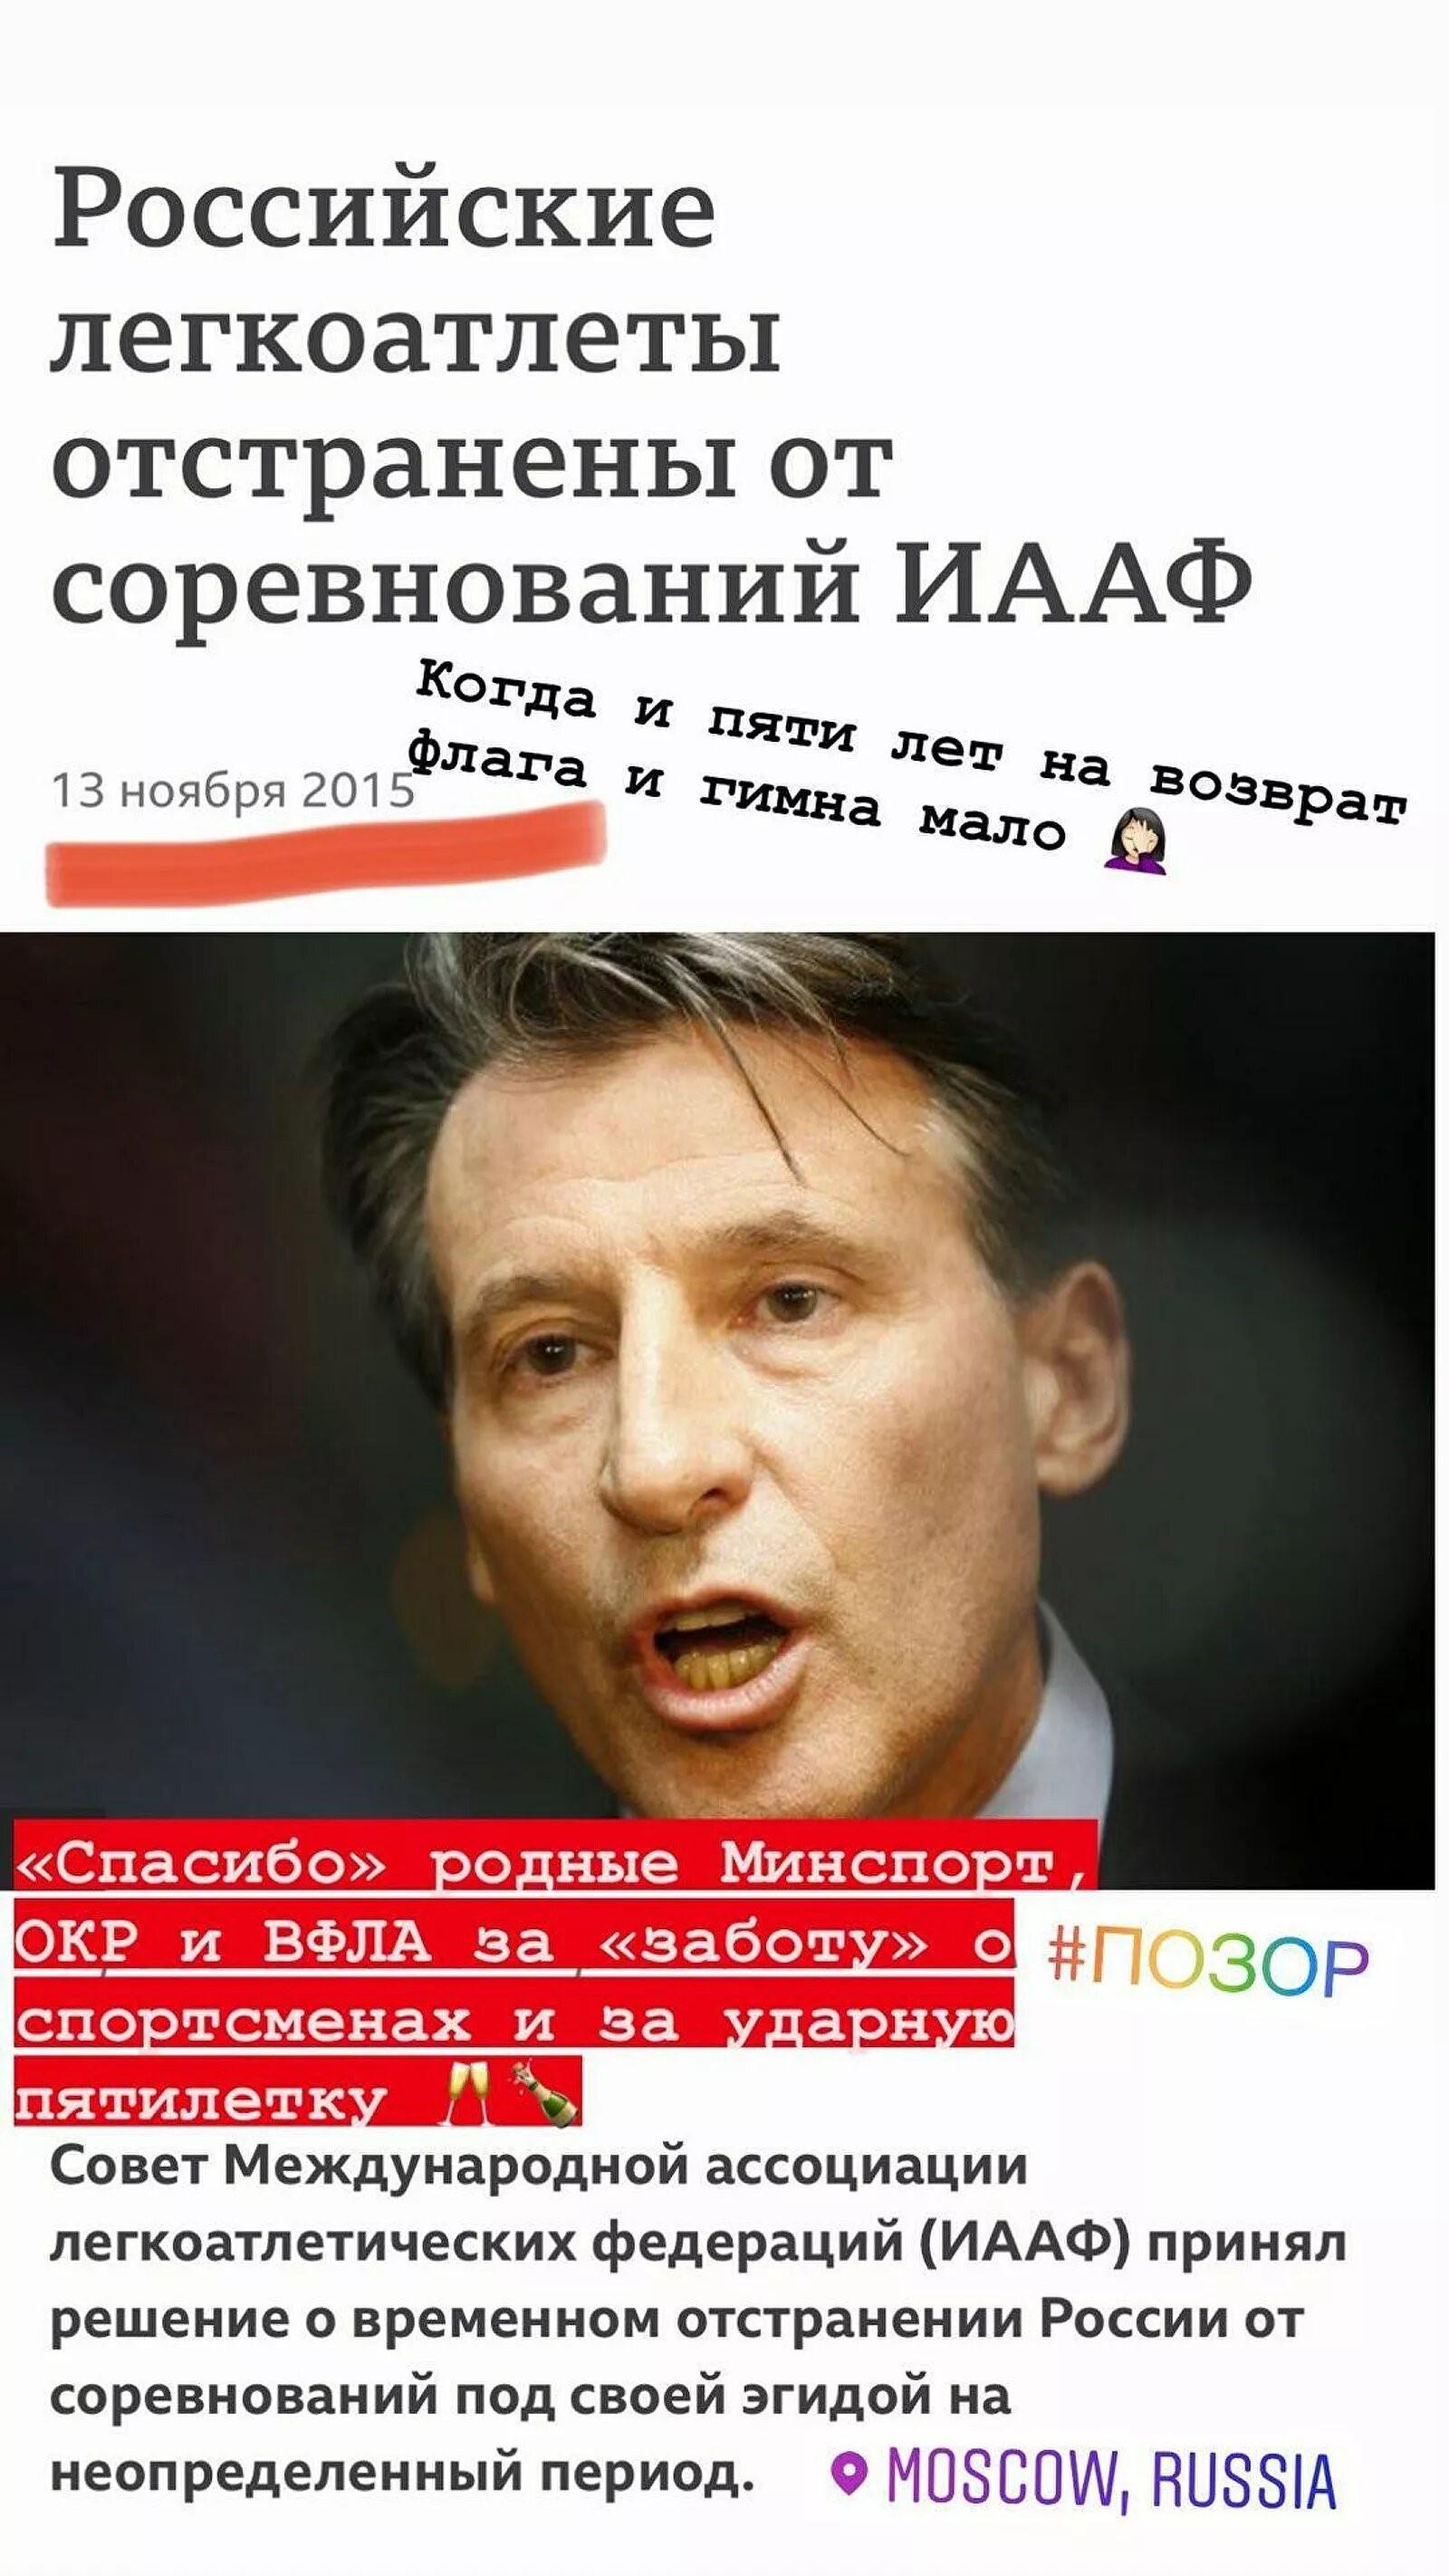 https://i.eurosport.com/2020/11/13/2936237.jpg